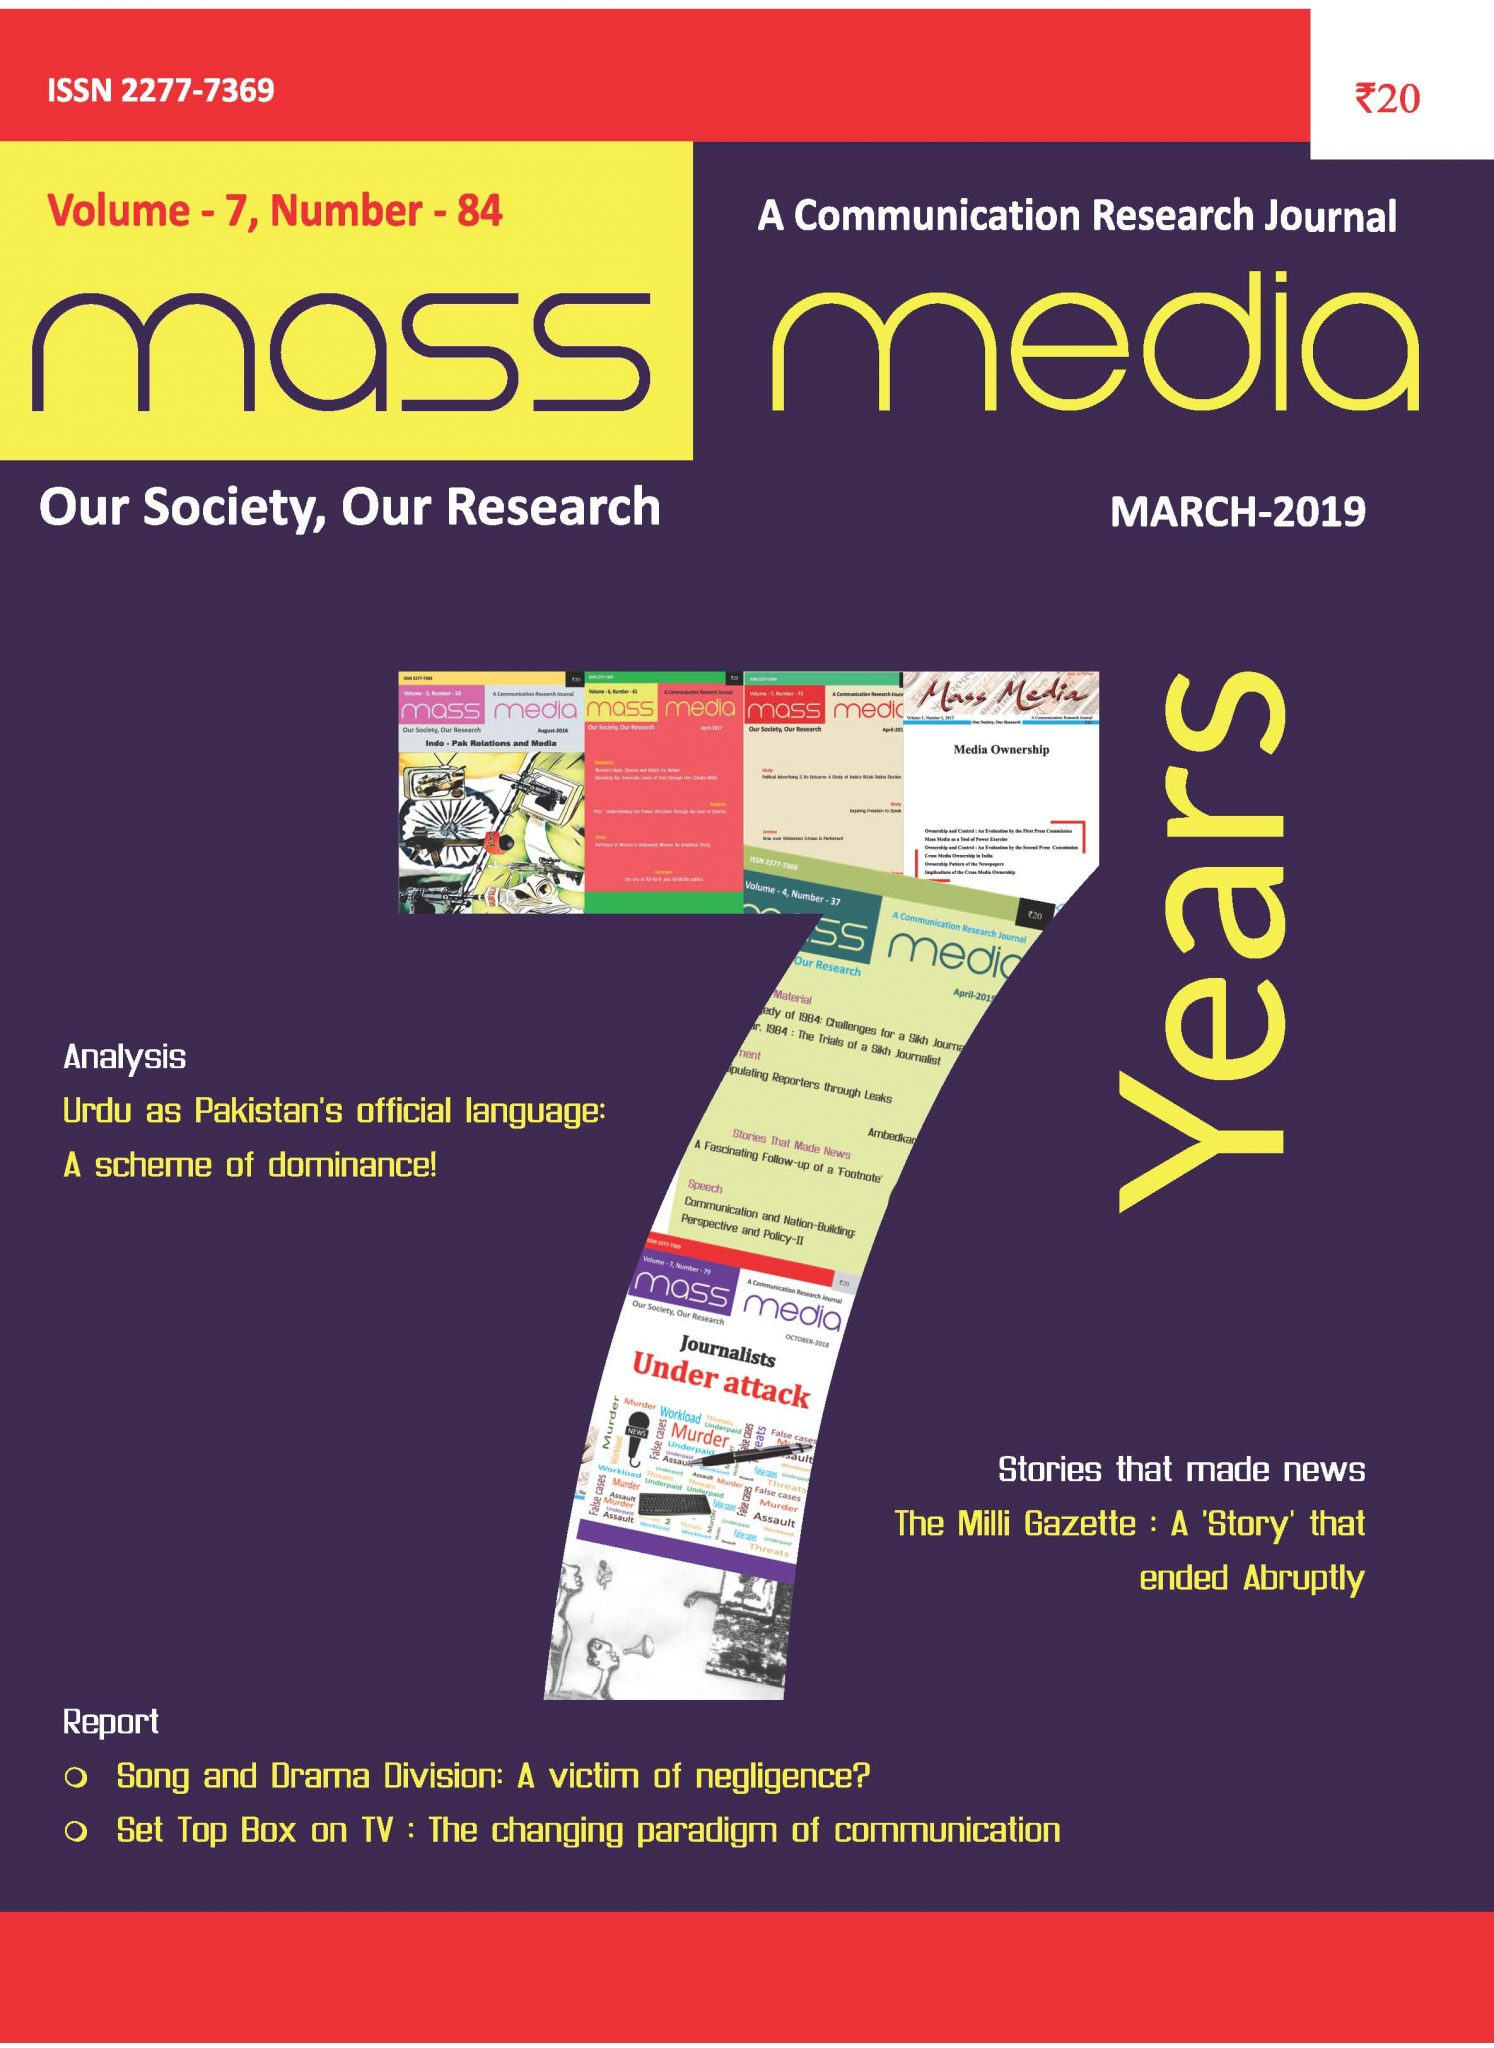 Mass Media (March 2019)